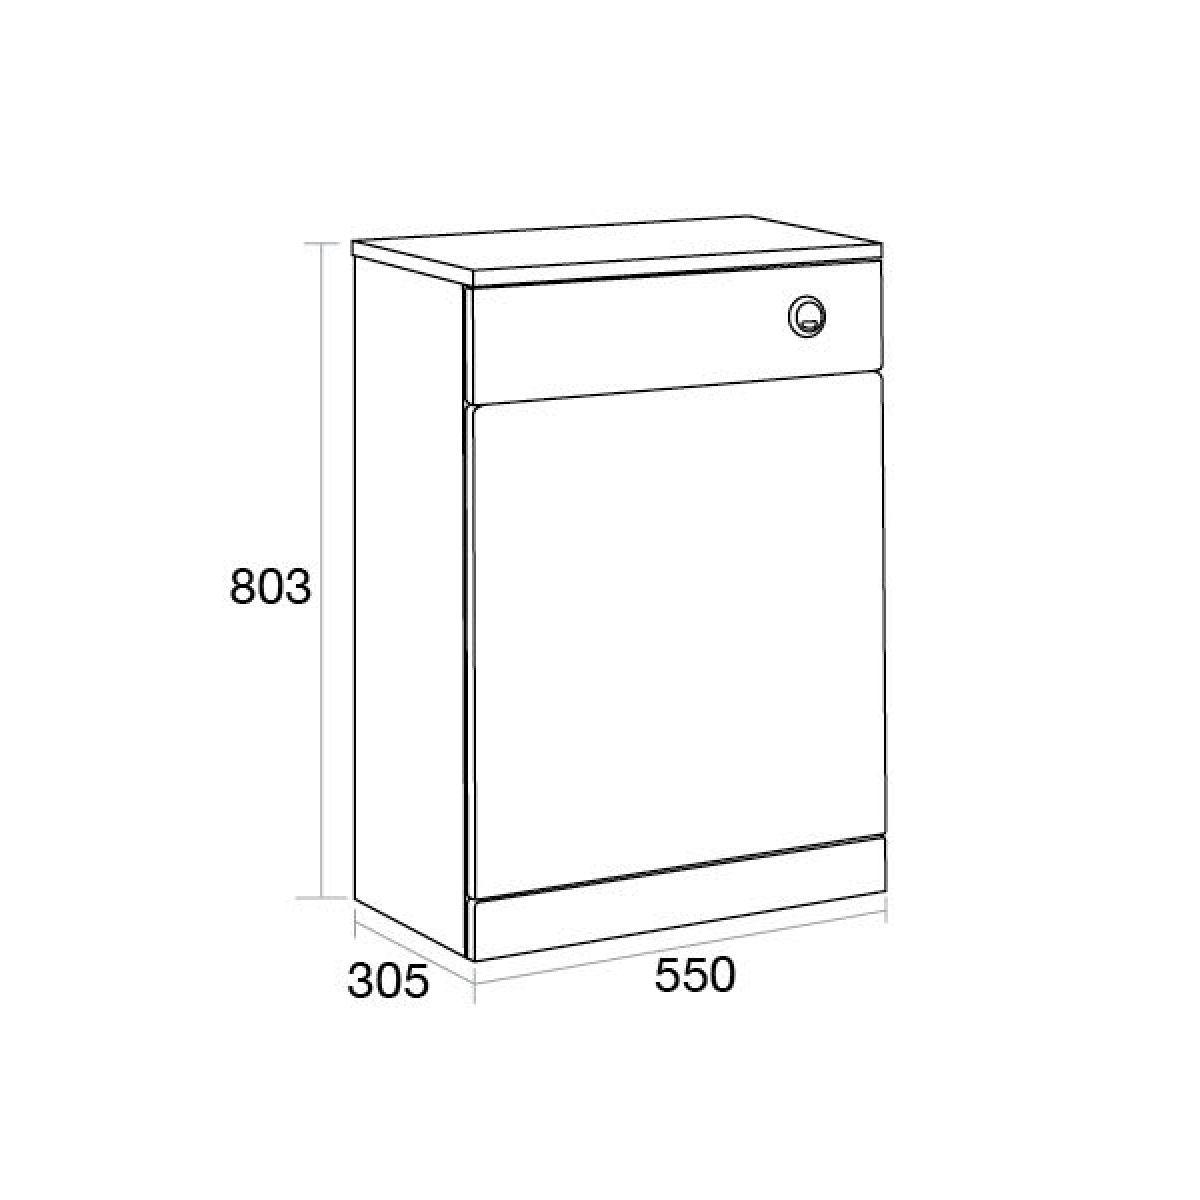 Ikoma White Gloss WC Unit 550mm Dimensions